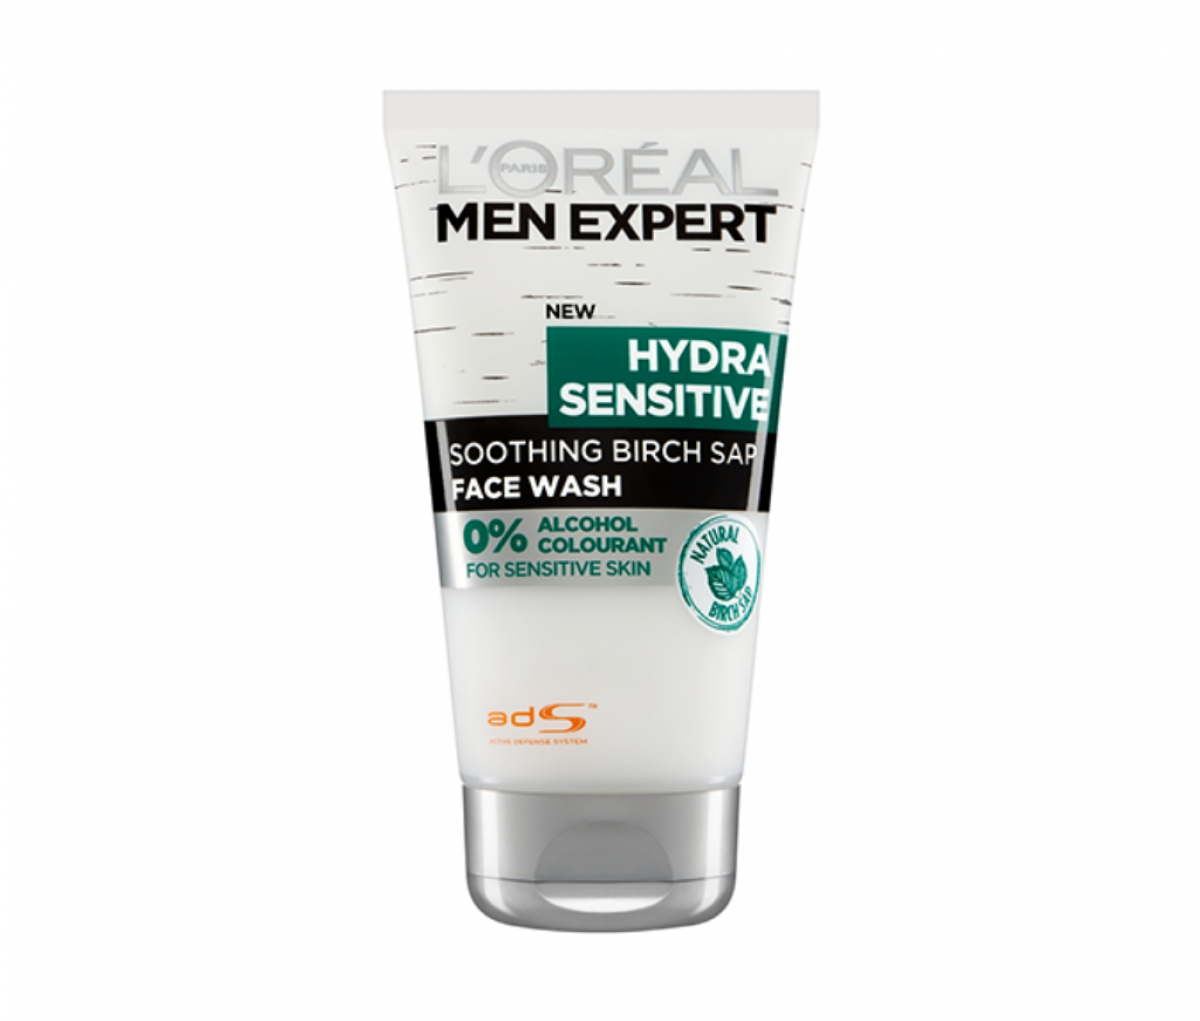 Loreal 150ml men expert hydra sensitive face wash